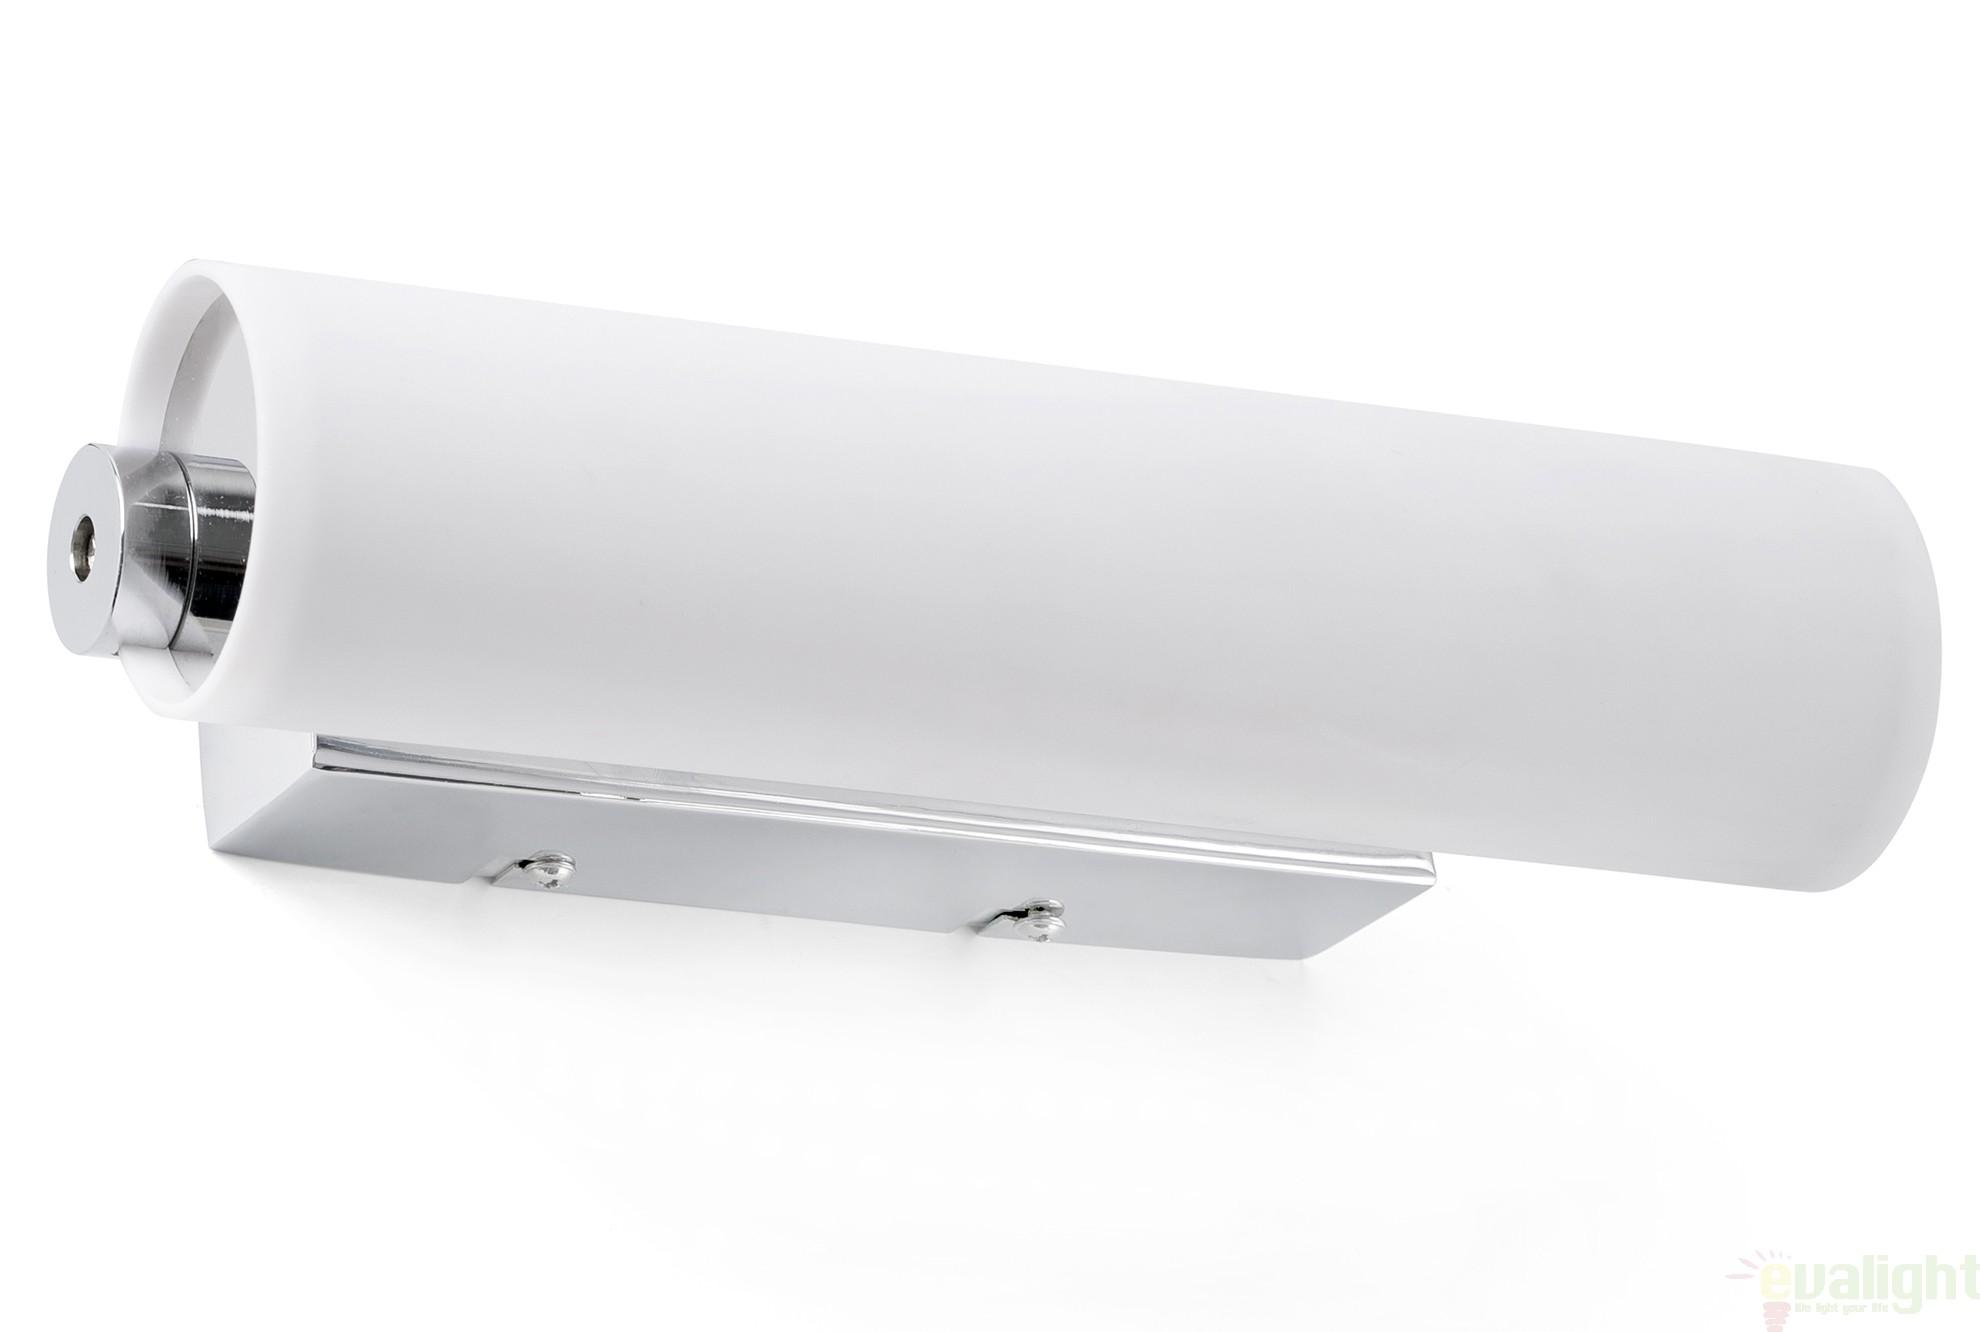 Plafoniere Baie : Plafoniera condus e max w pentru baie ip alb crom pret